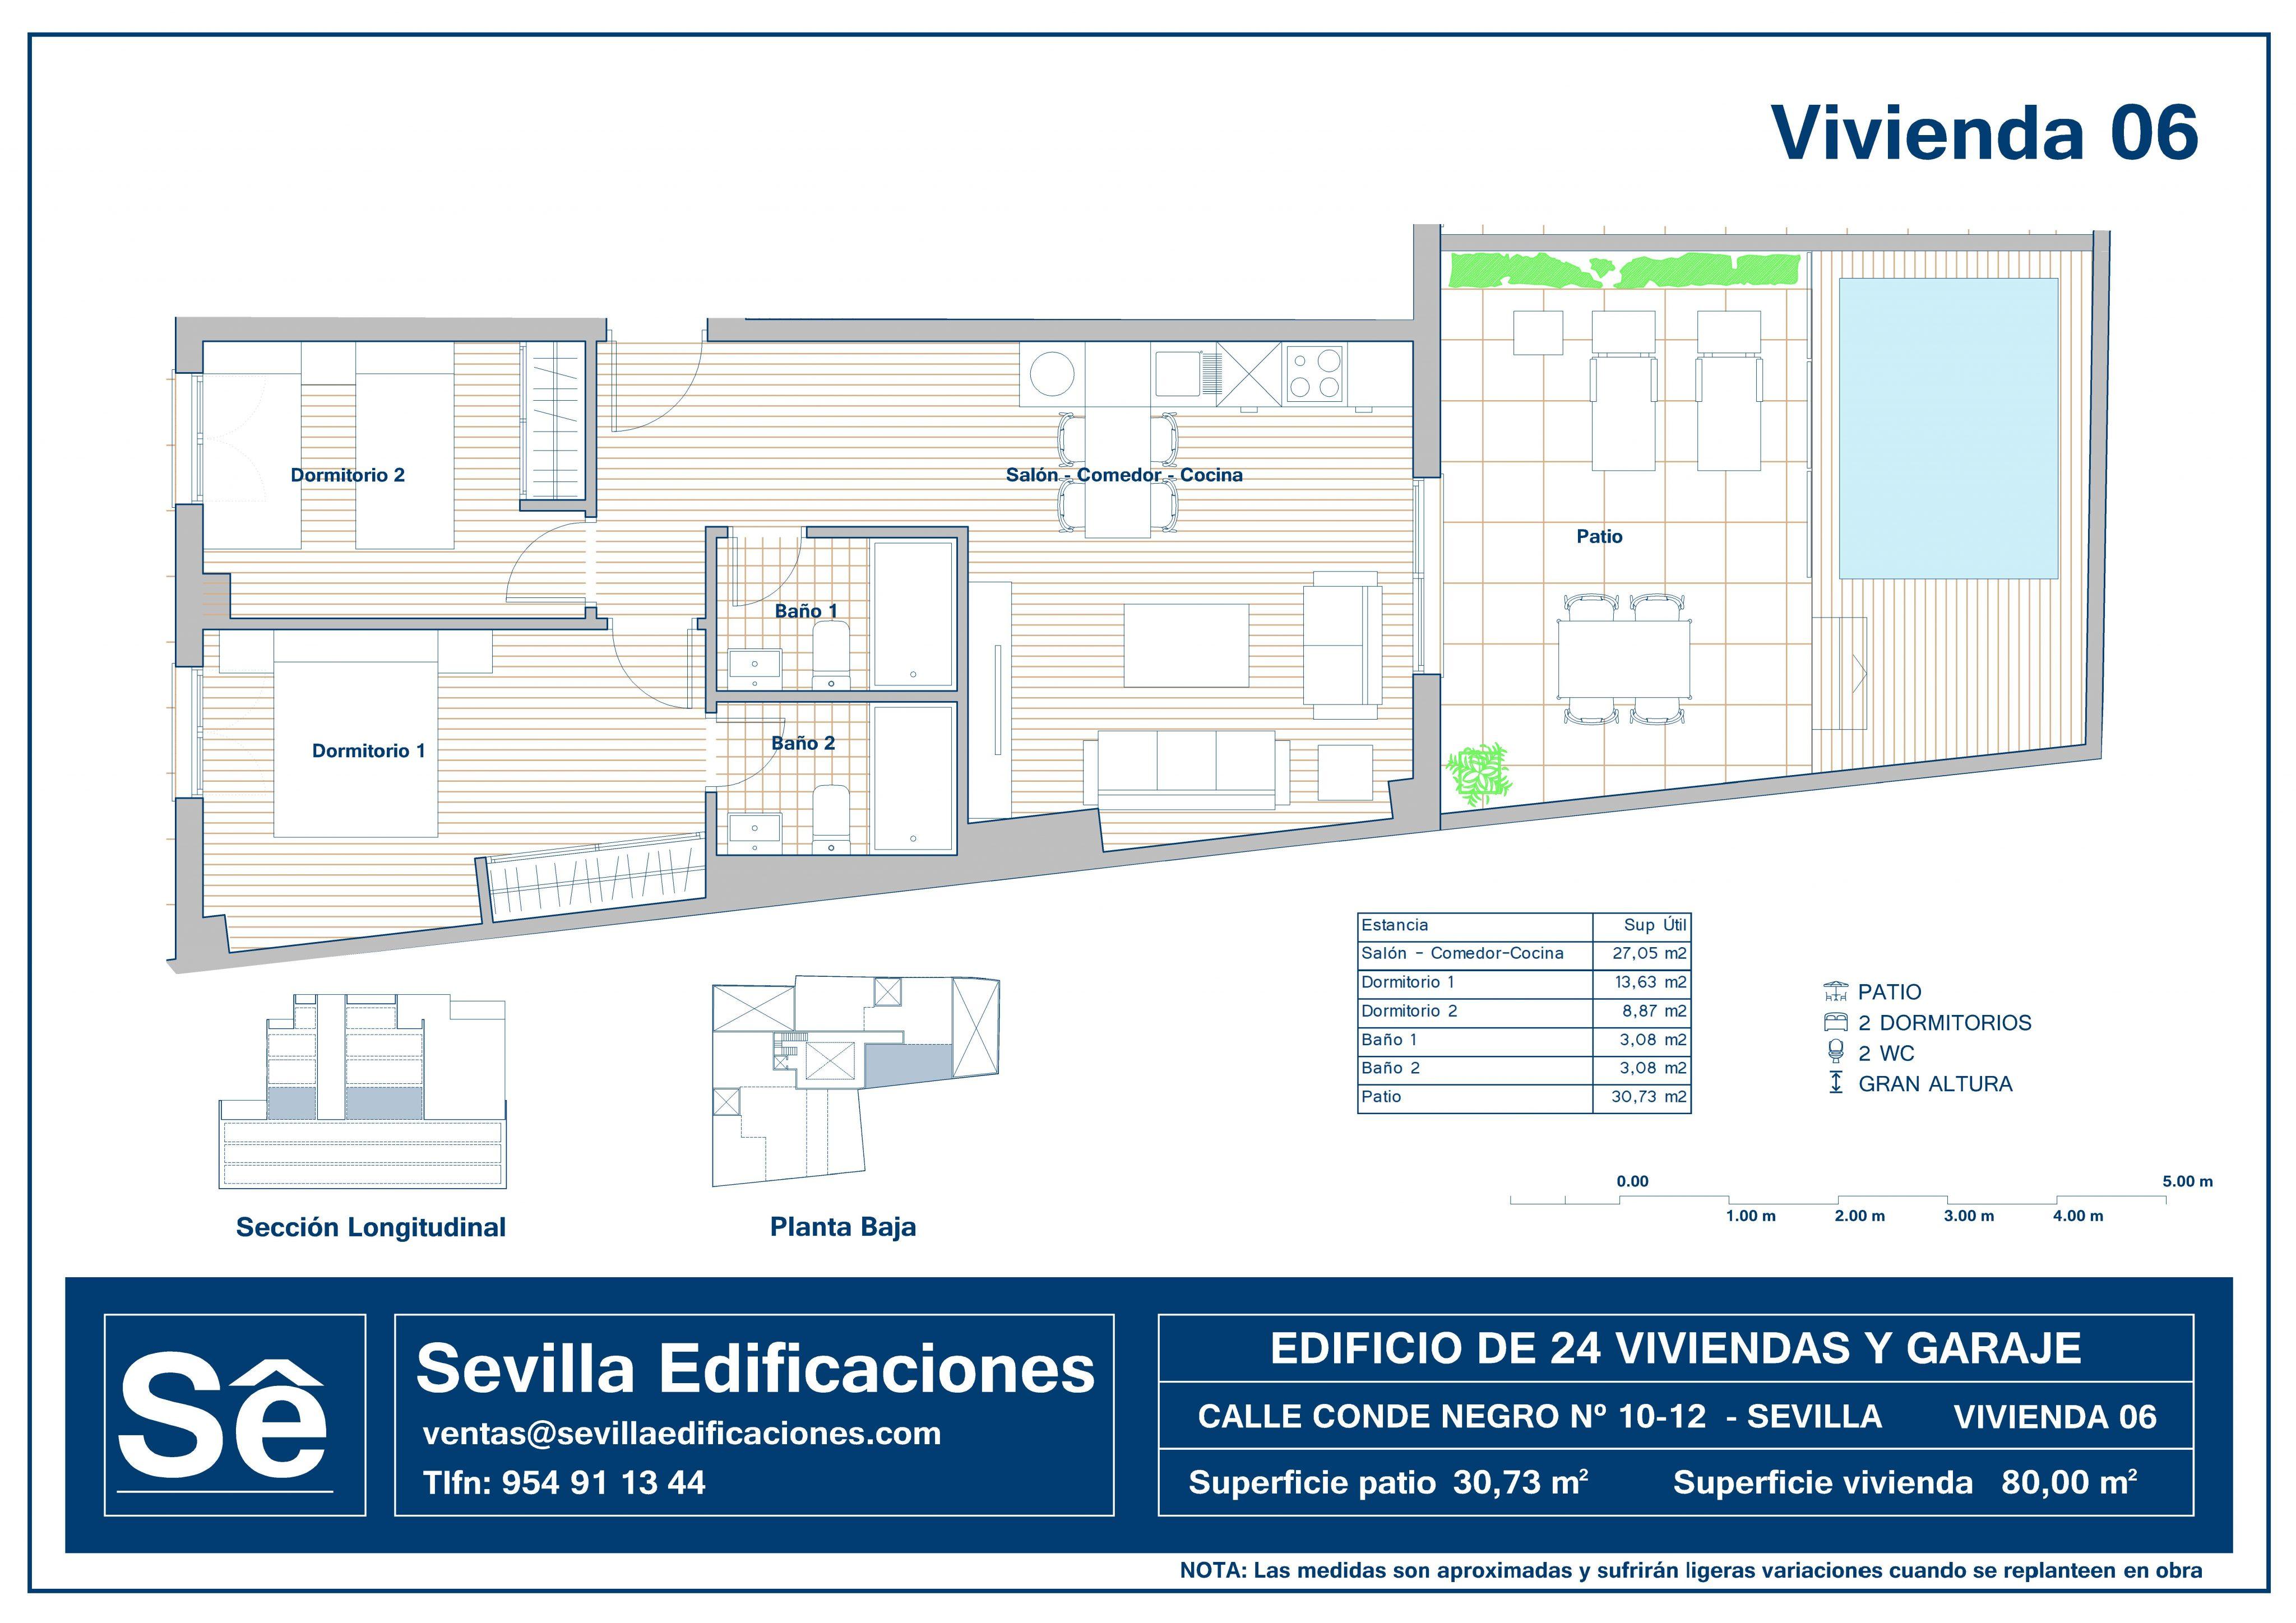 CONDENEGRO_VIVIENDA_06